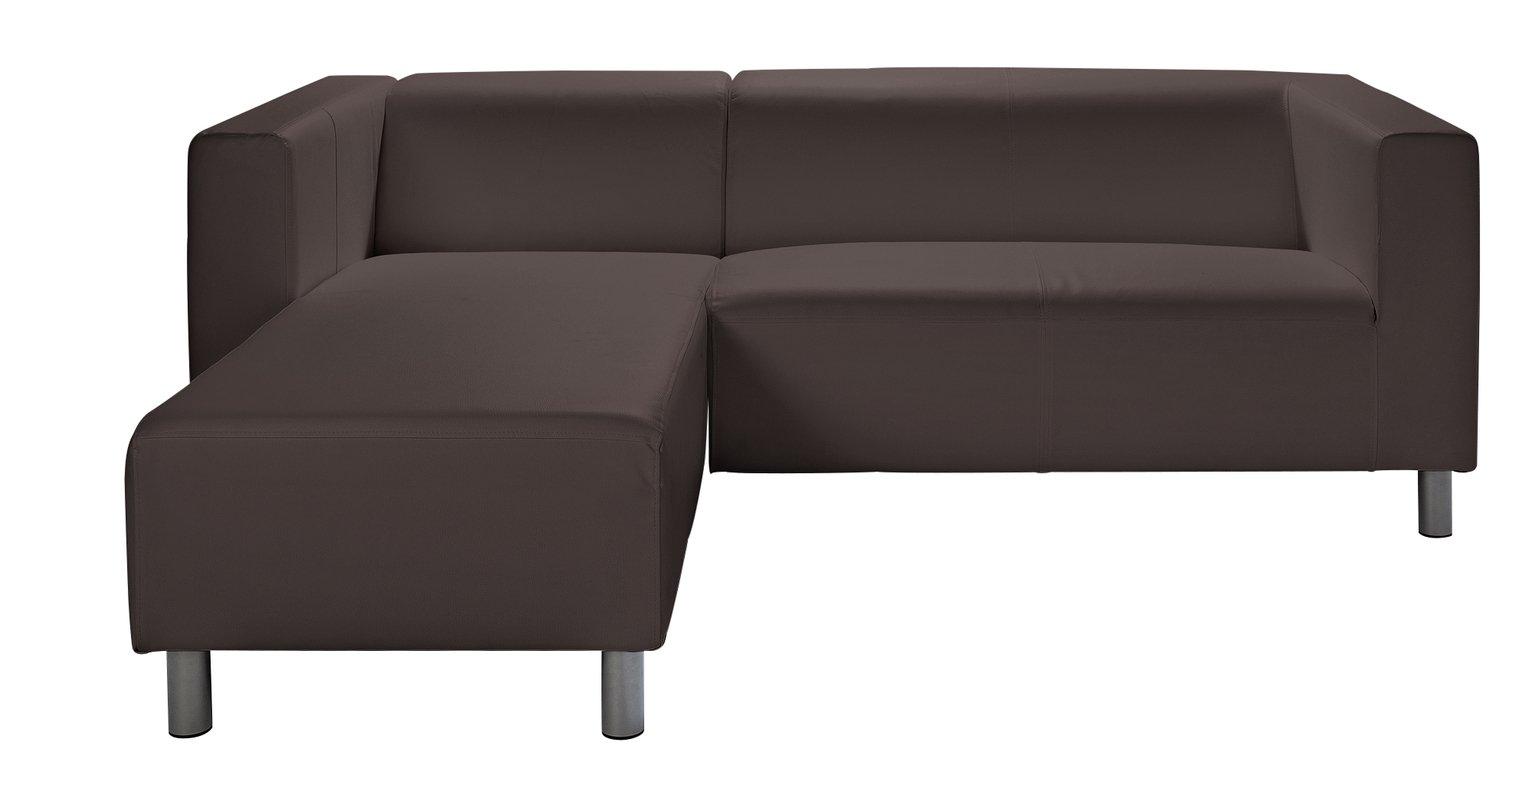 Argos Home Moda Compact Left Corner Faux Leather Sofa -Brown